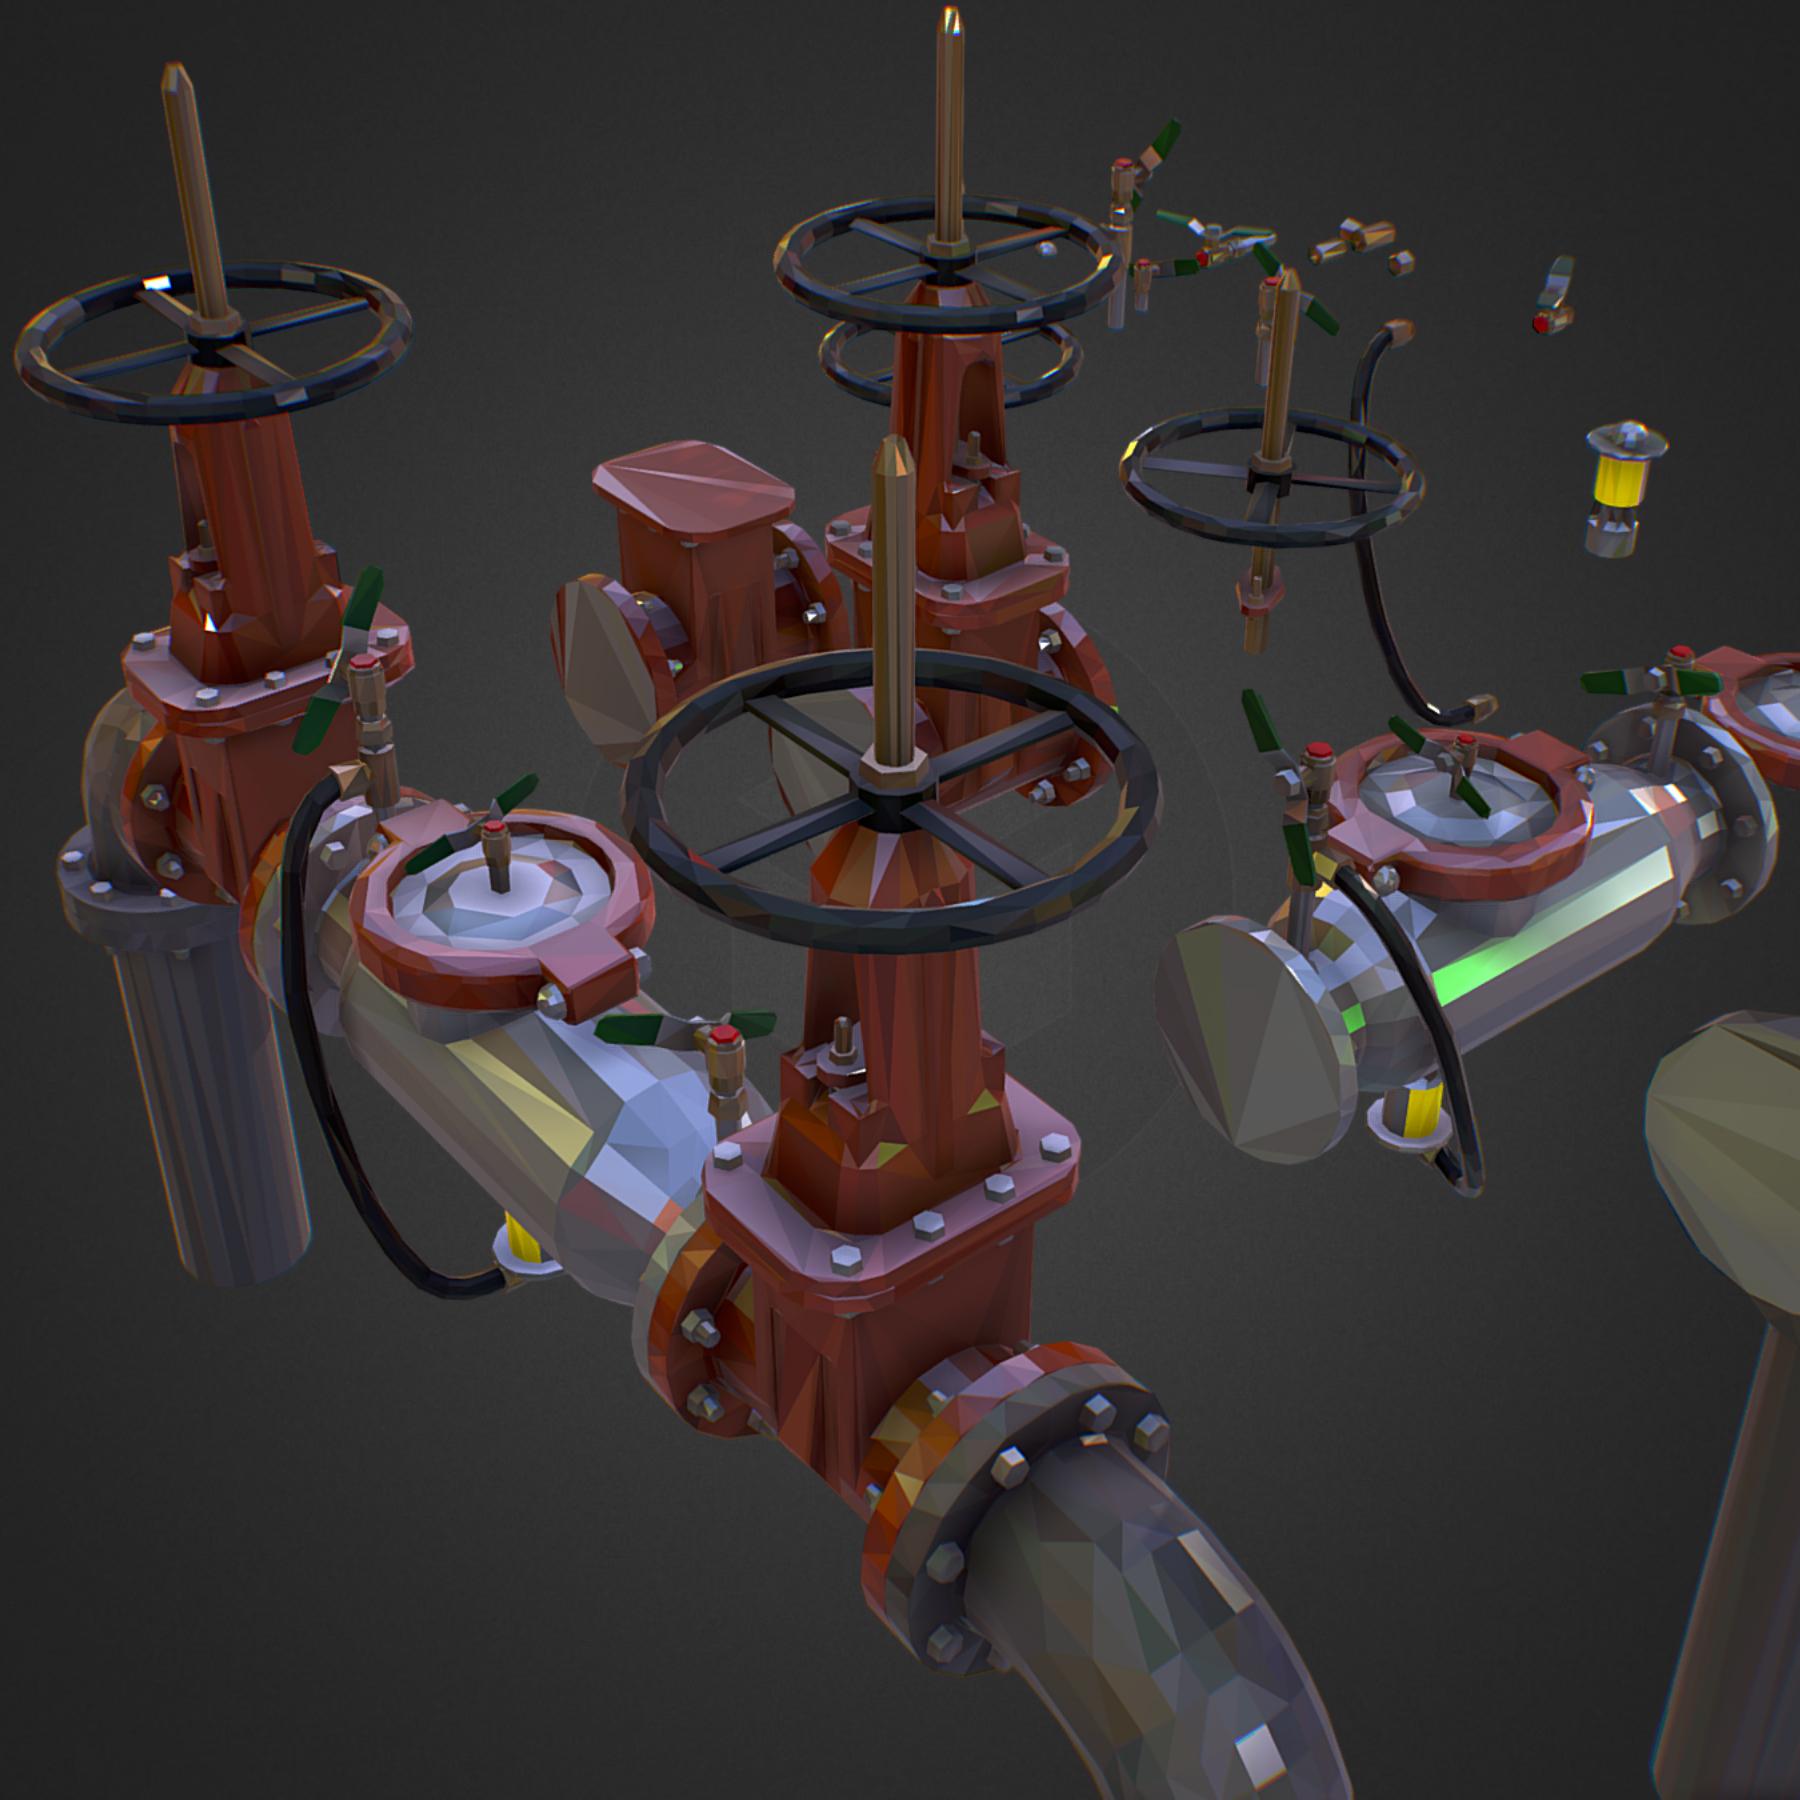 Low Poly ART Backflow Water Pipe Constructor 3d model max 3ds max plugin fbx ma mb tga targa icb vda vst pix obj 272562